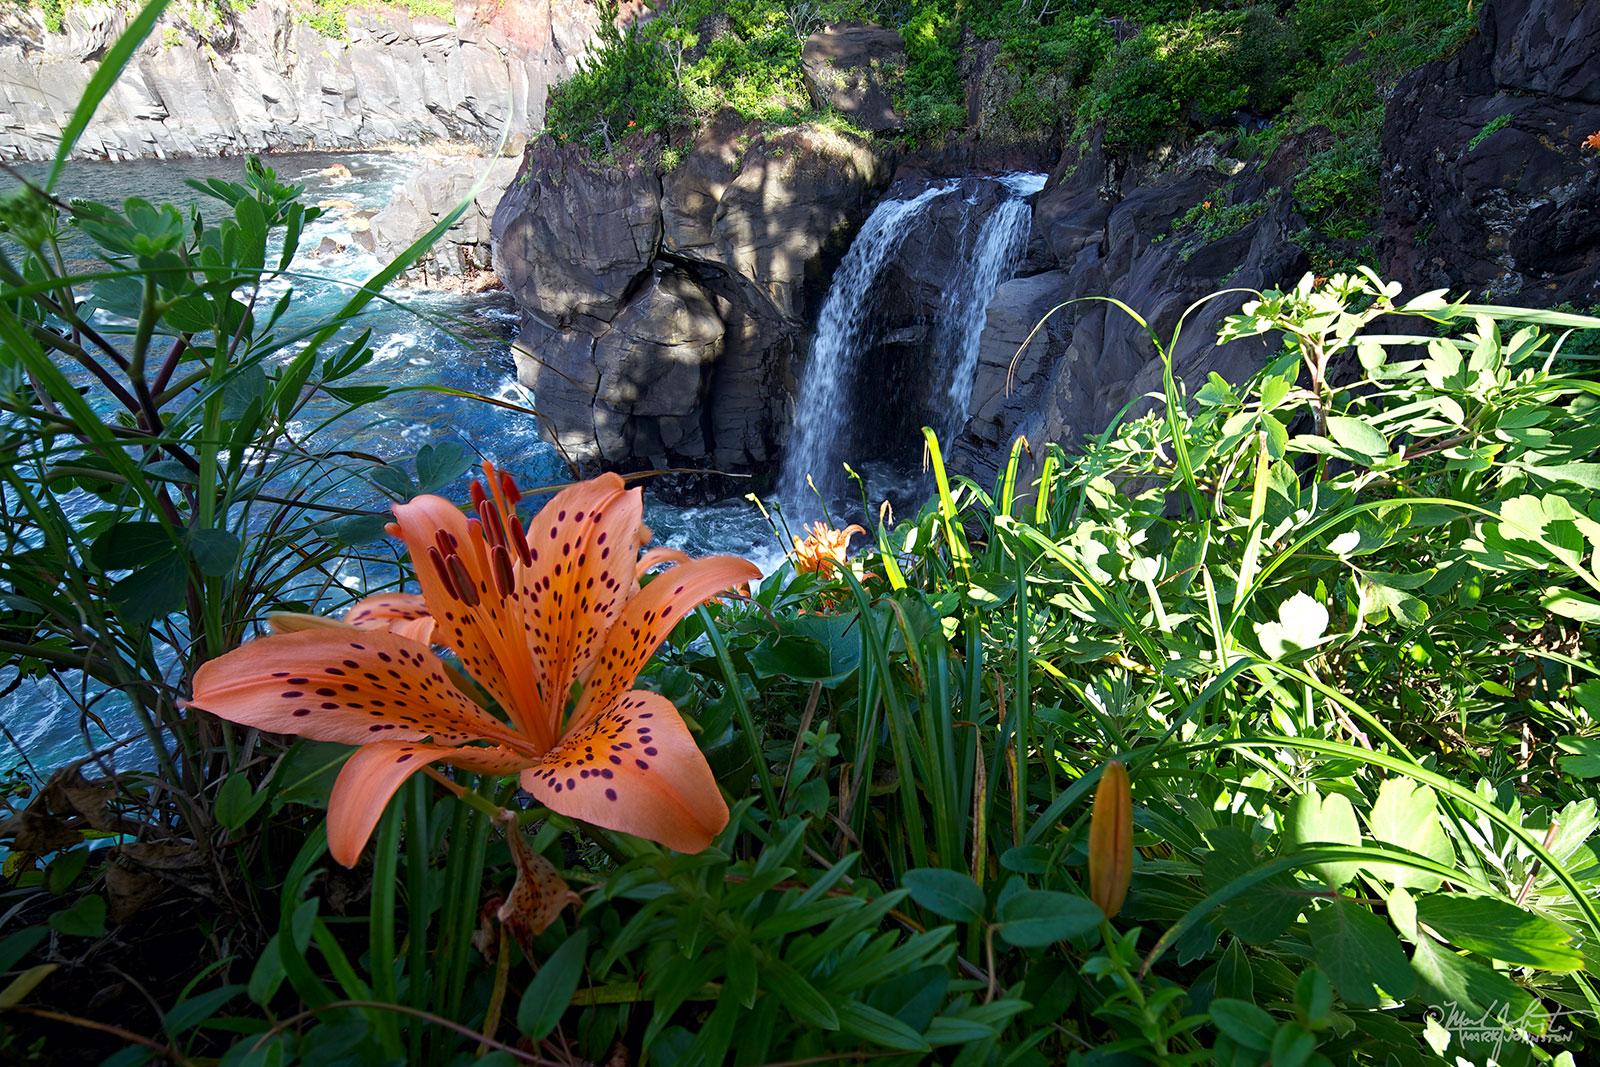 Tajima Falls [対島滝] and lily, Izu Penninsula, Shizuoka Prefecture, Japan.